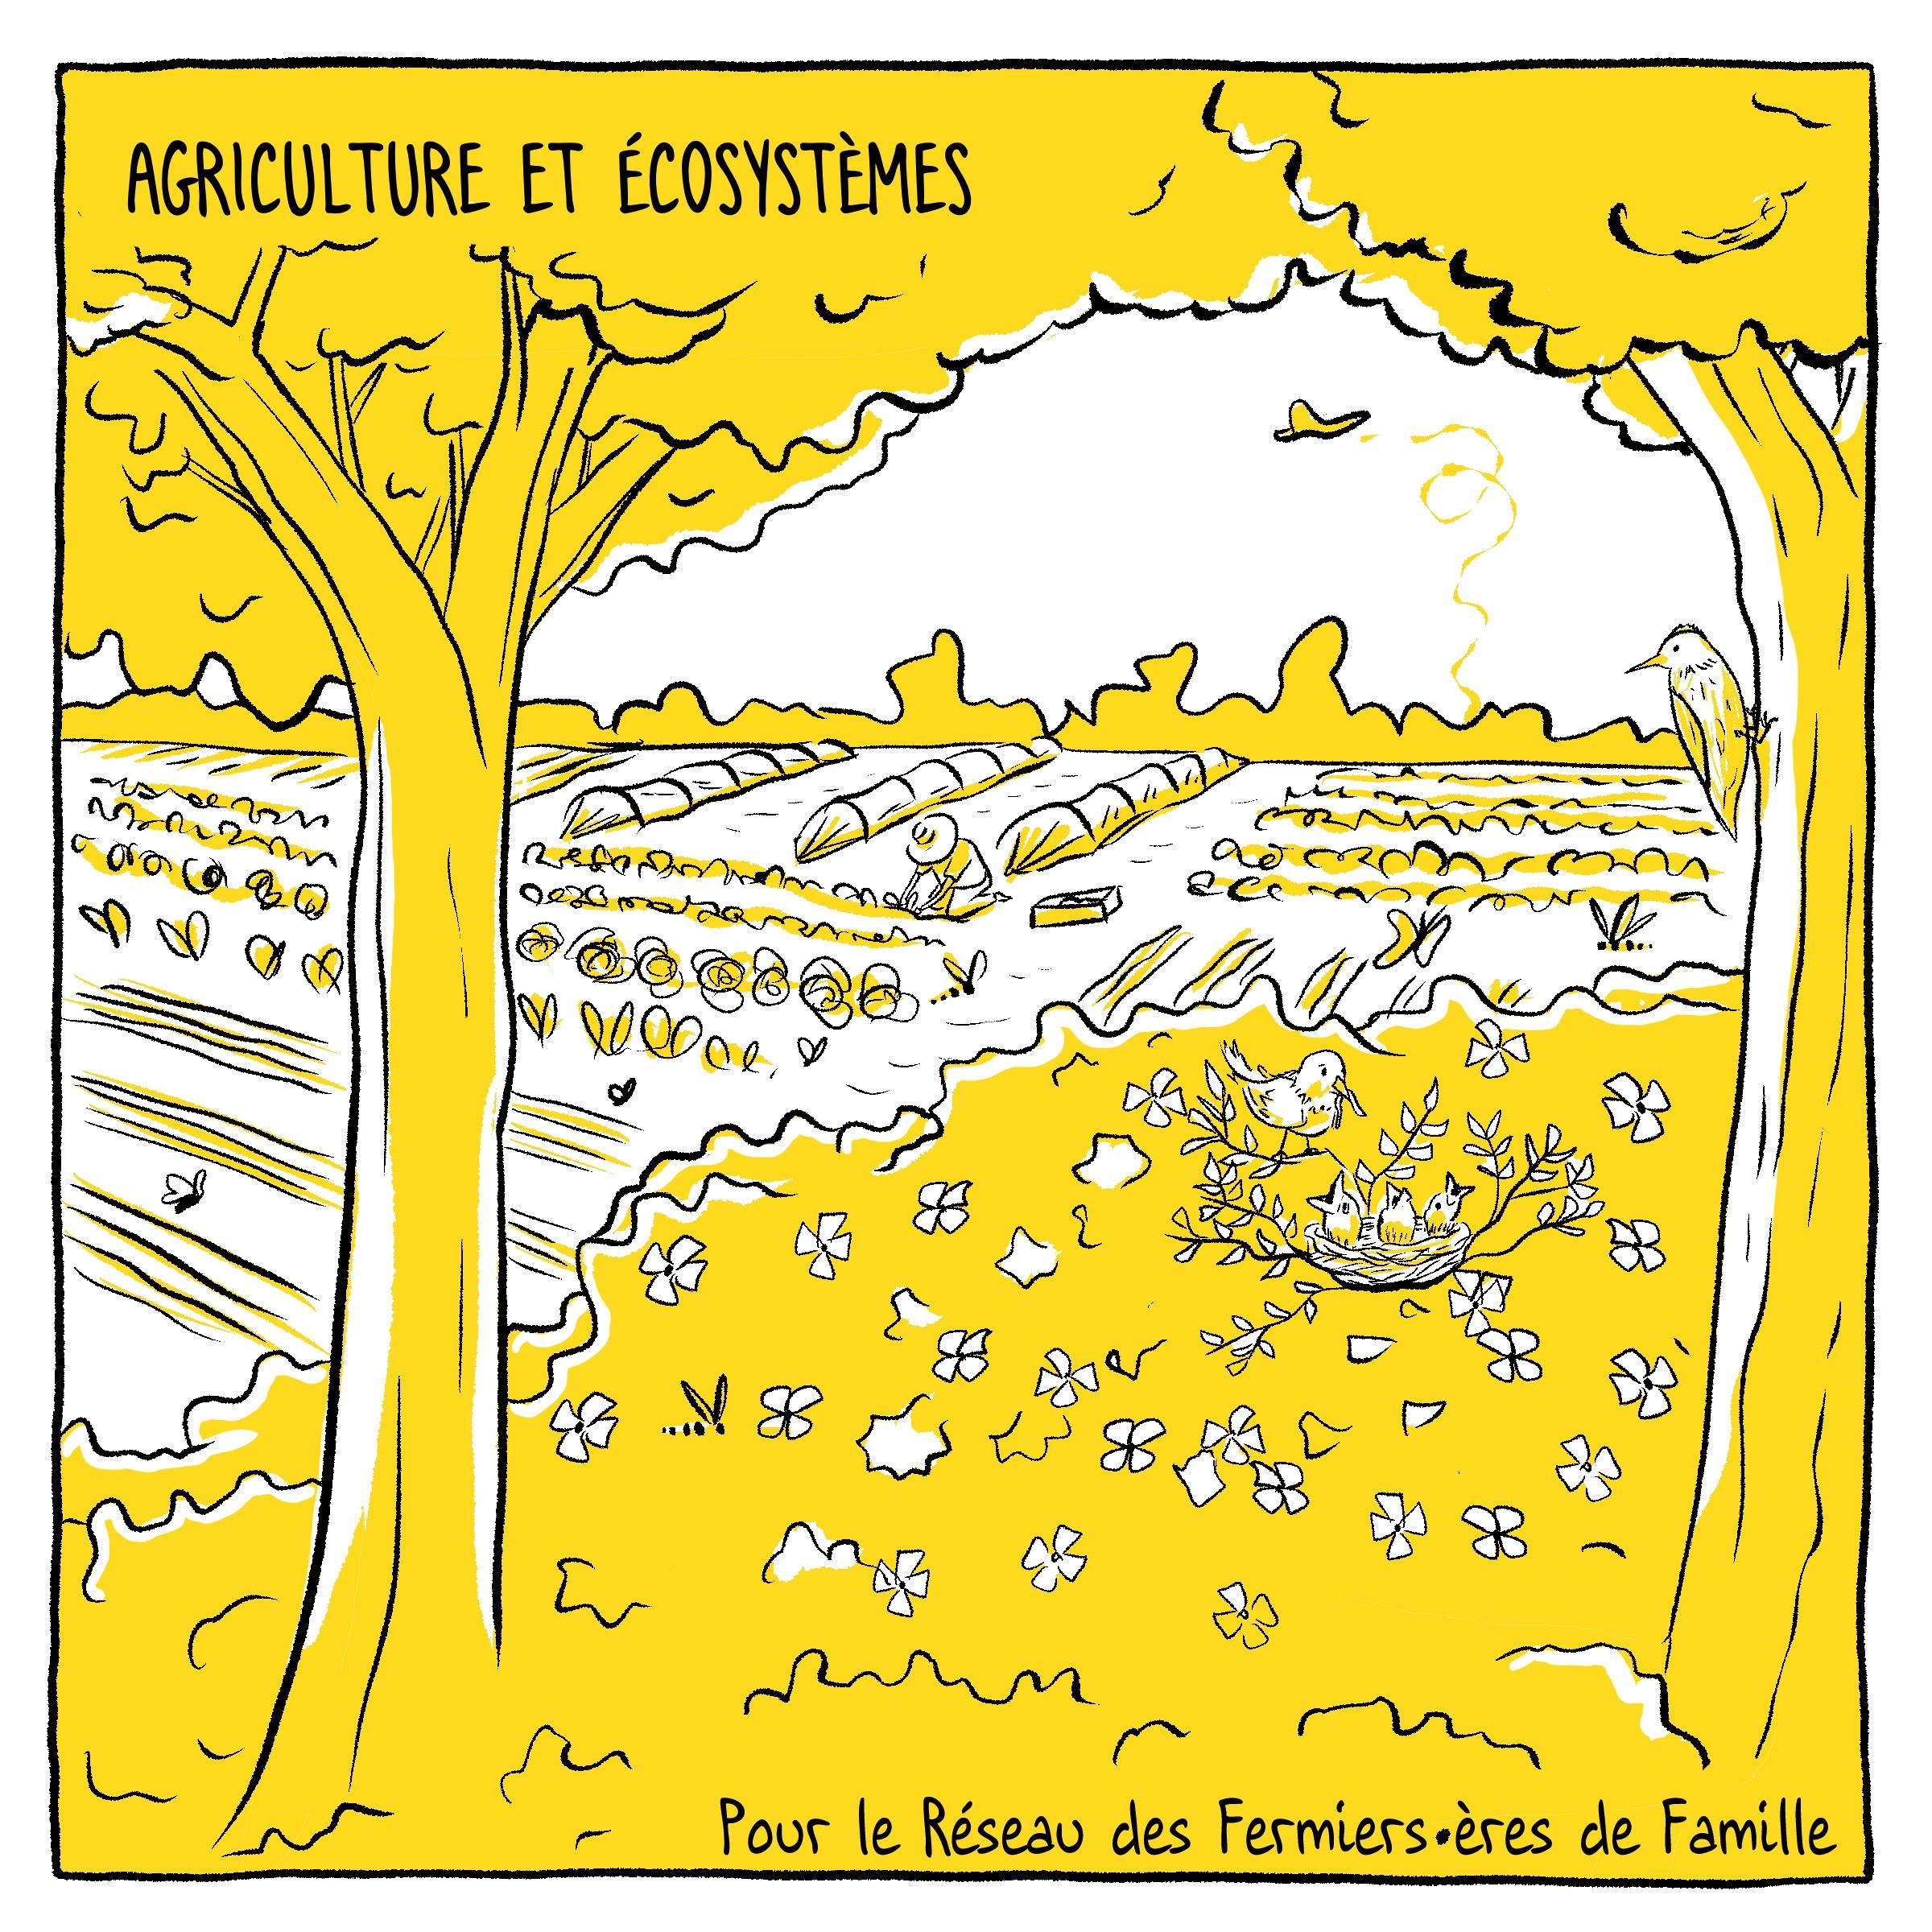 Agriculture et écosystèmes - MelikaIllustration bd